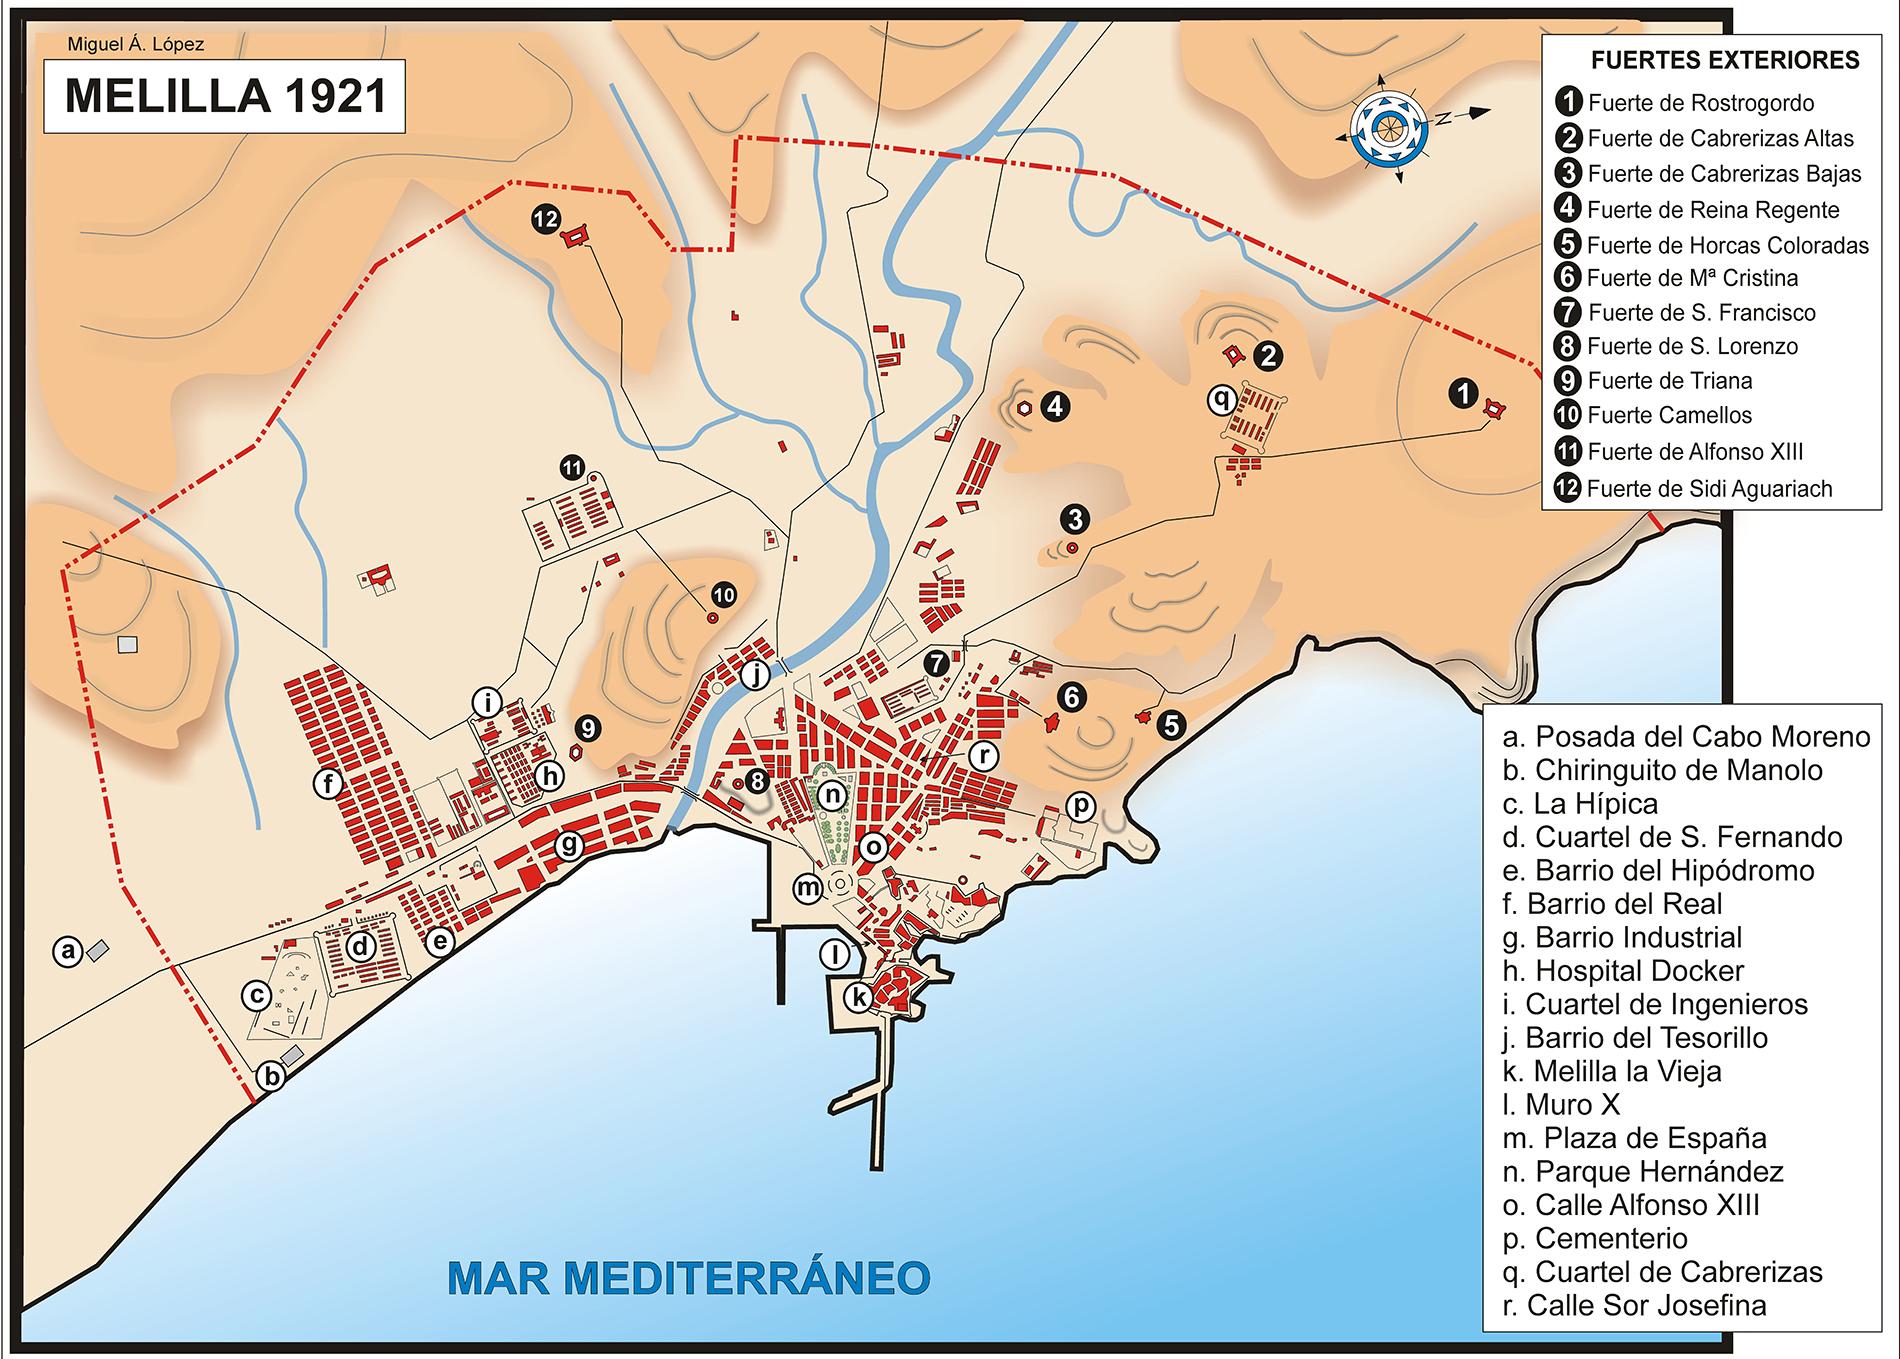 Mapa de Melilla en 1921